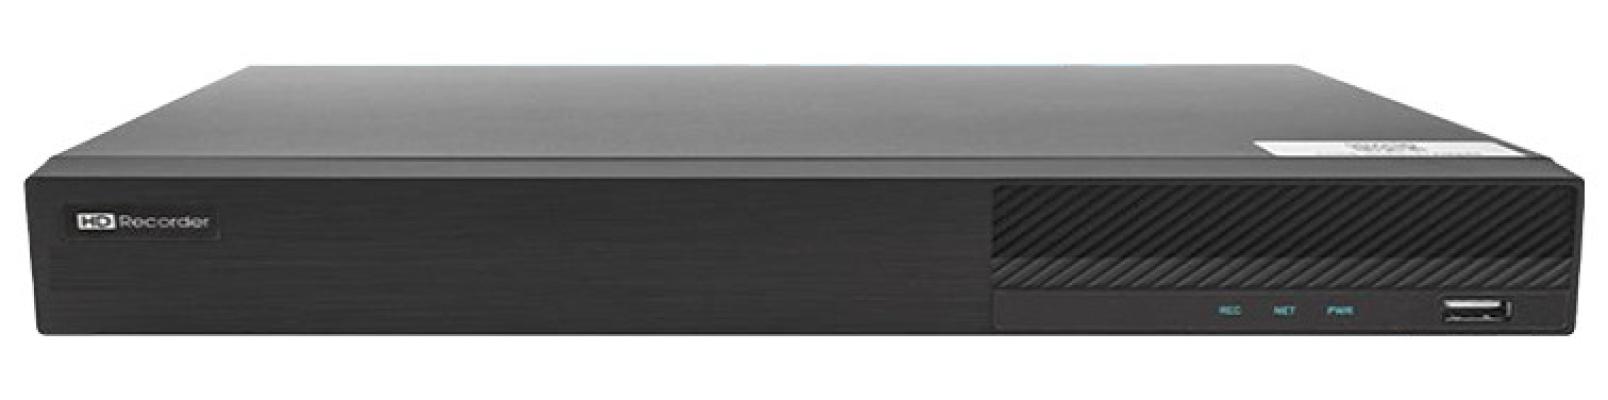 5 in 1 (AHD, CVI, TVI, 960H, IP) 16CH H.265 Pentaplex 8MP Recording DVR (AHD5216F)